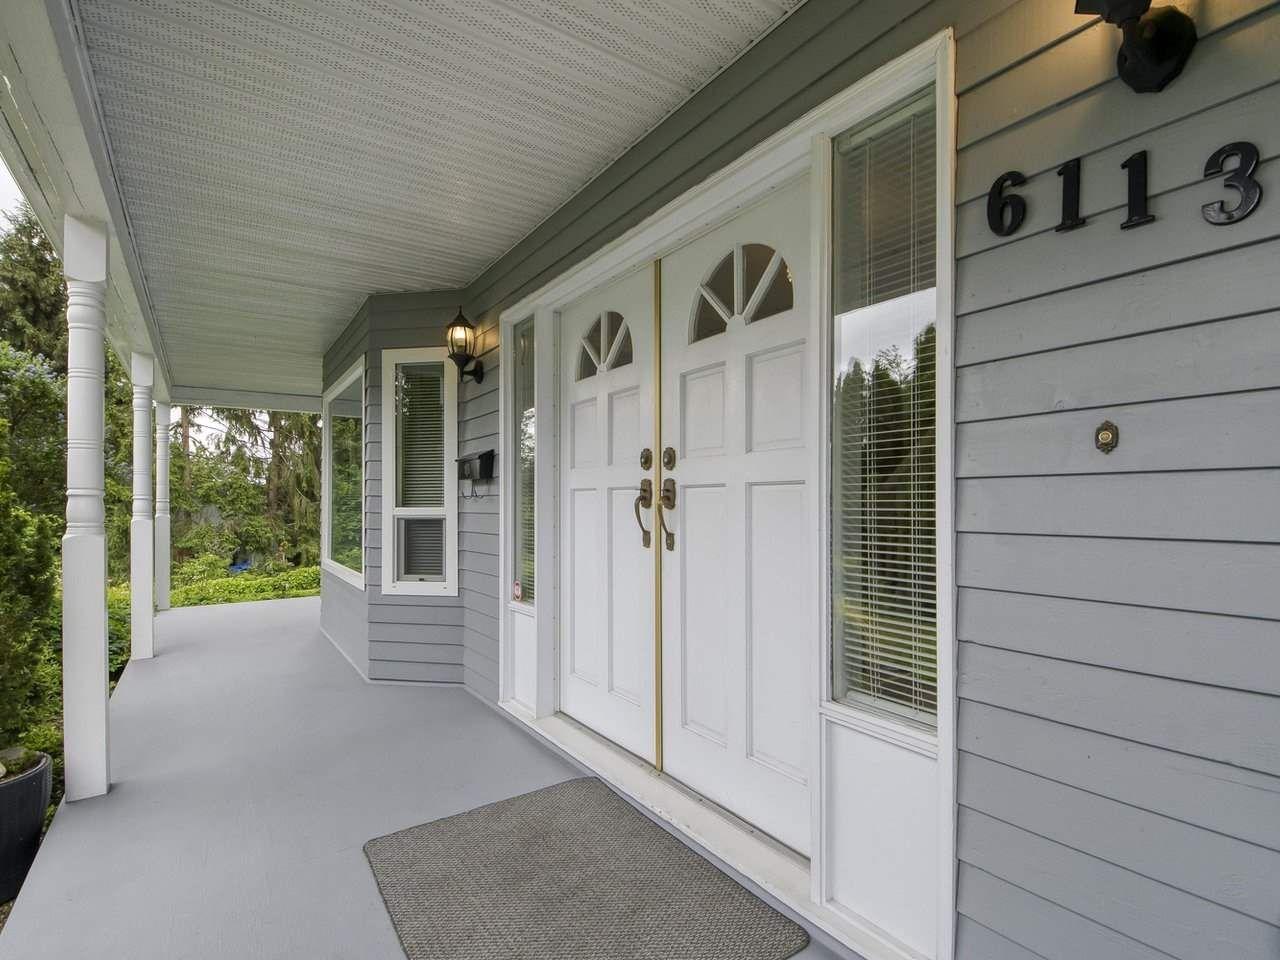 "Photo 4: Photos: 6113 KILLARNEY Drive in Surrey: Sullivan Station House for sale in ""SULLIVAN STATION"" : MLS®# R2465142"